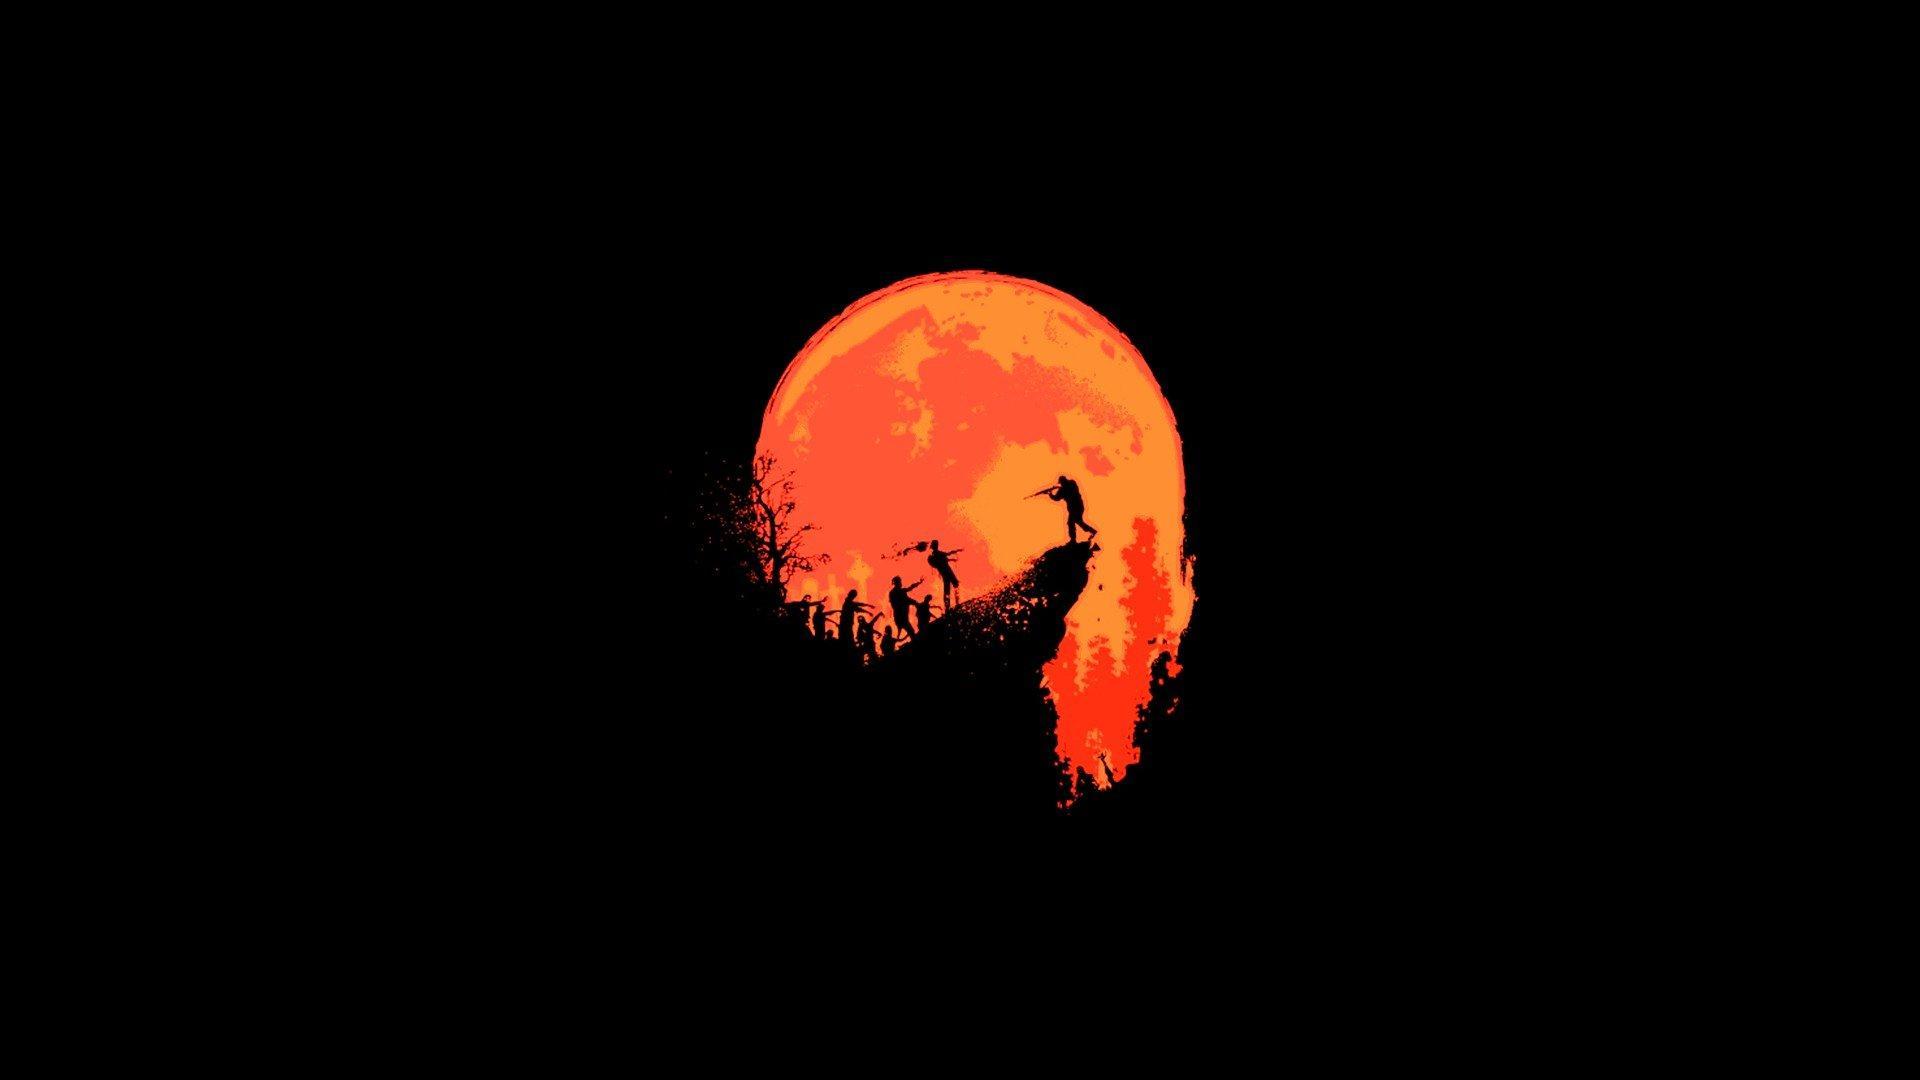 Unduh 70 Wallpaper Black Orange Hd Gratis